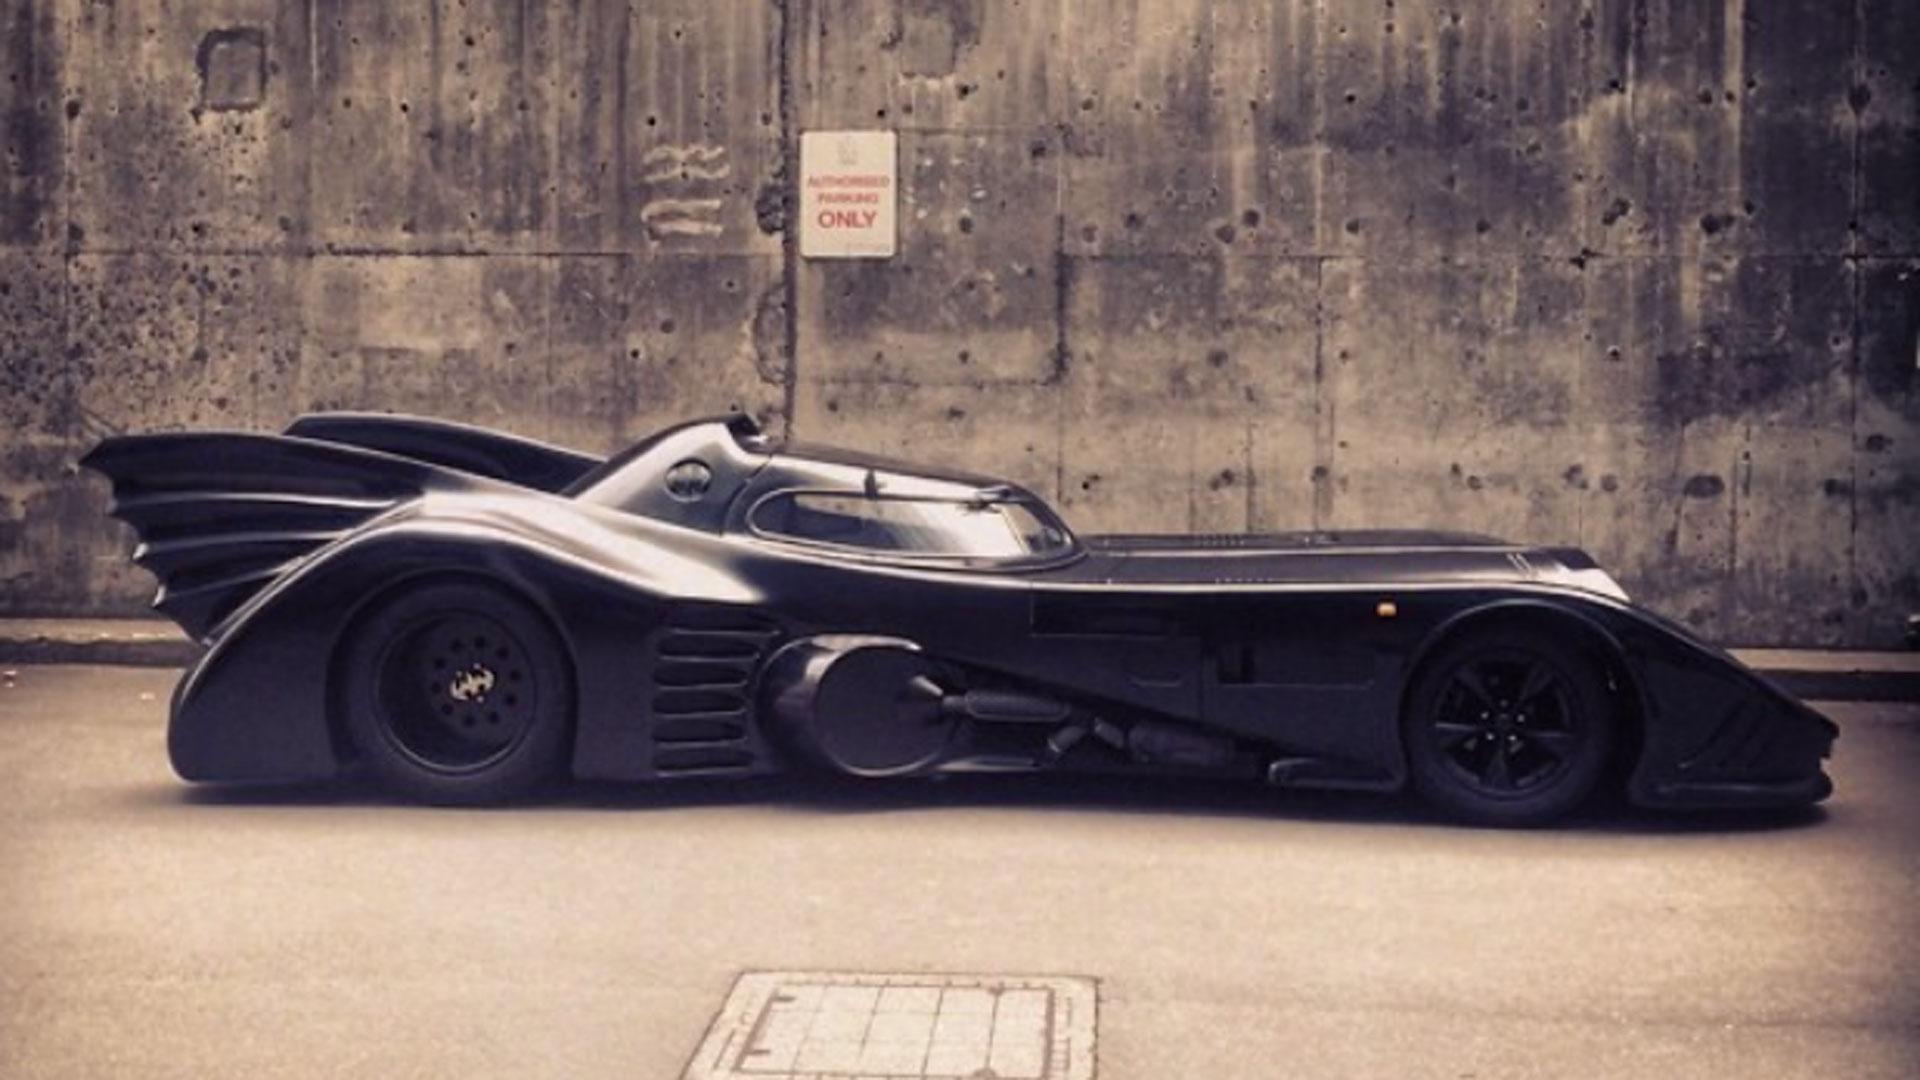 Tim Burton Batmobile replica